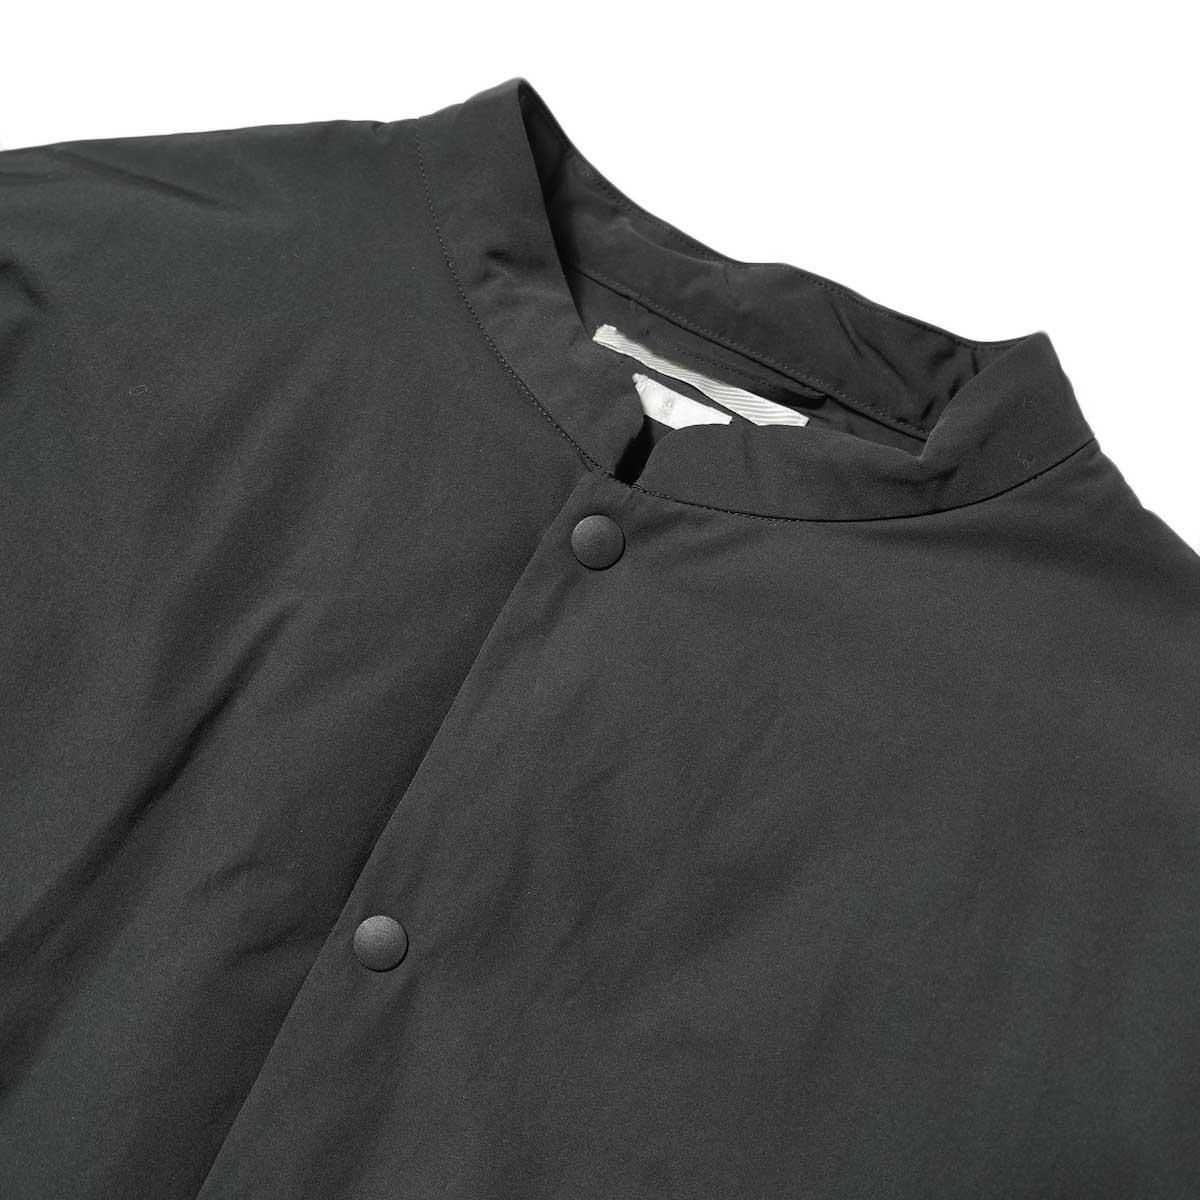 blurhms / Stand-up Collar Down Jacket (Black) フロント